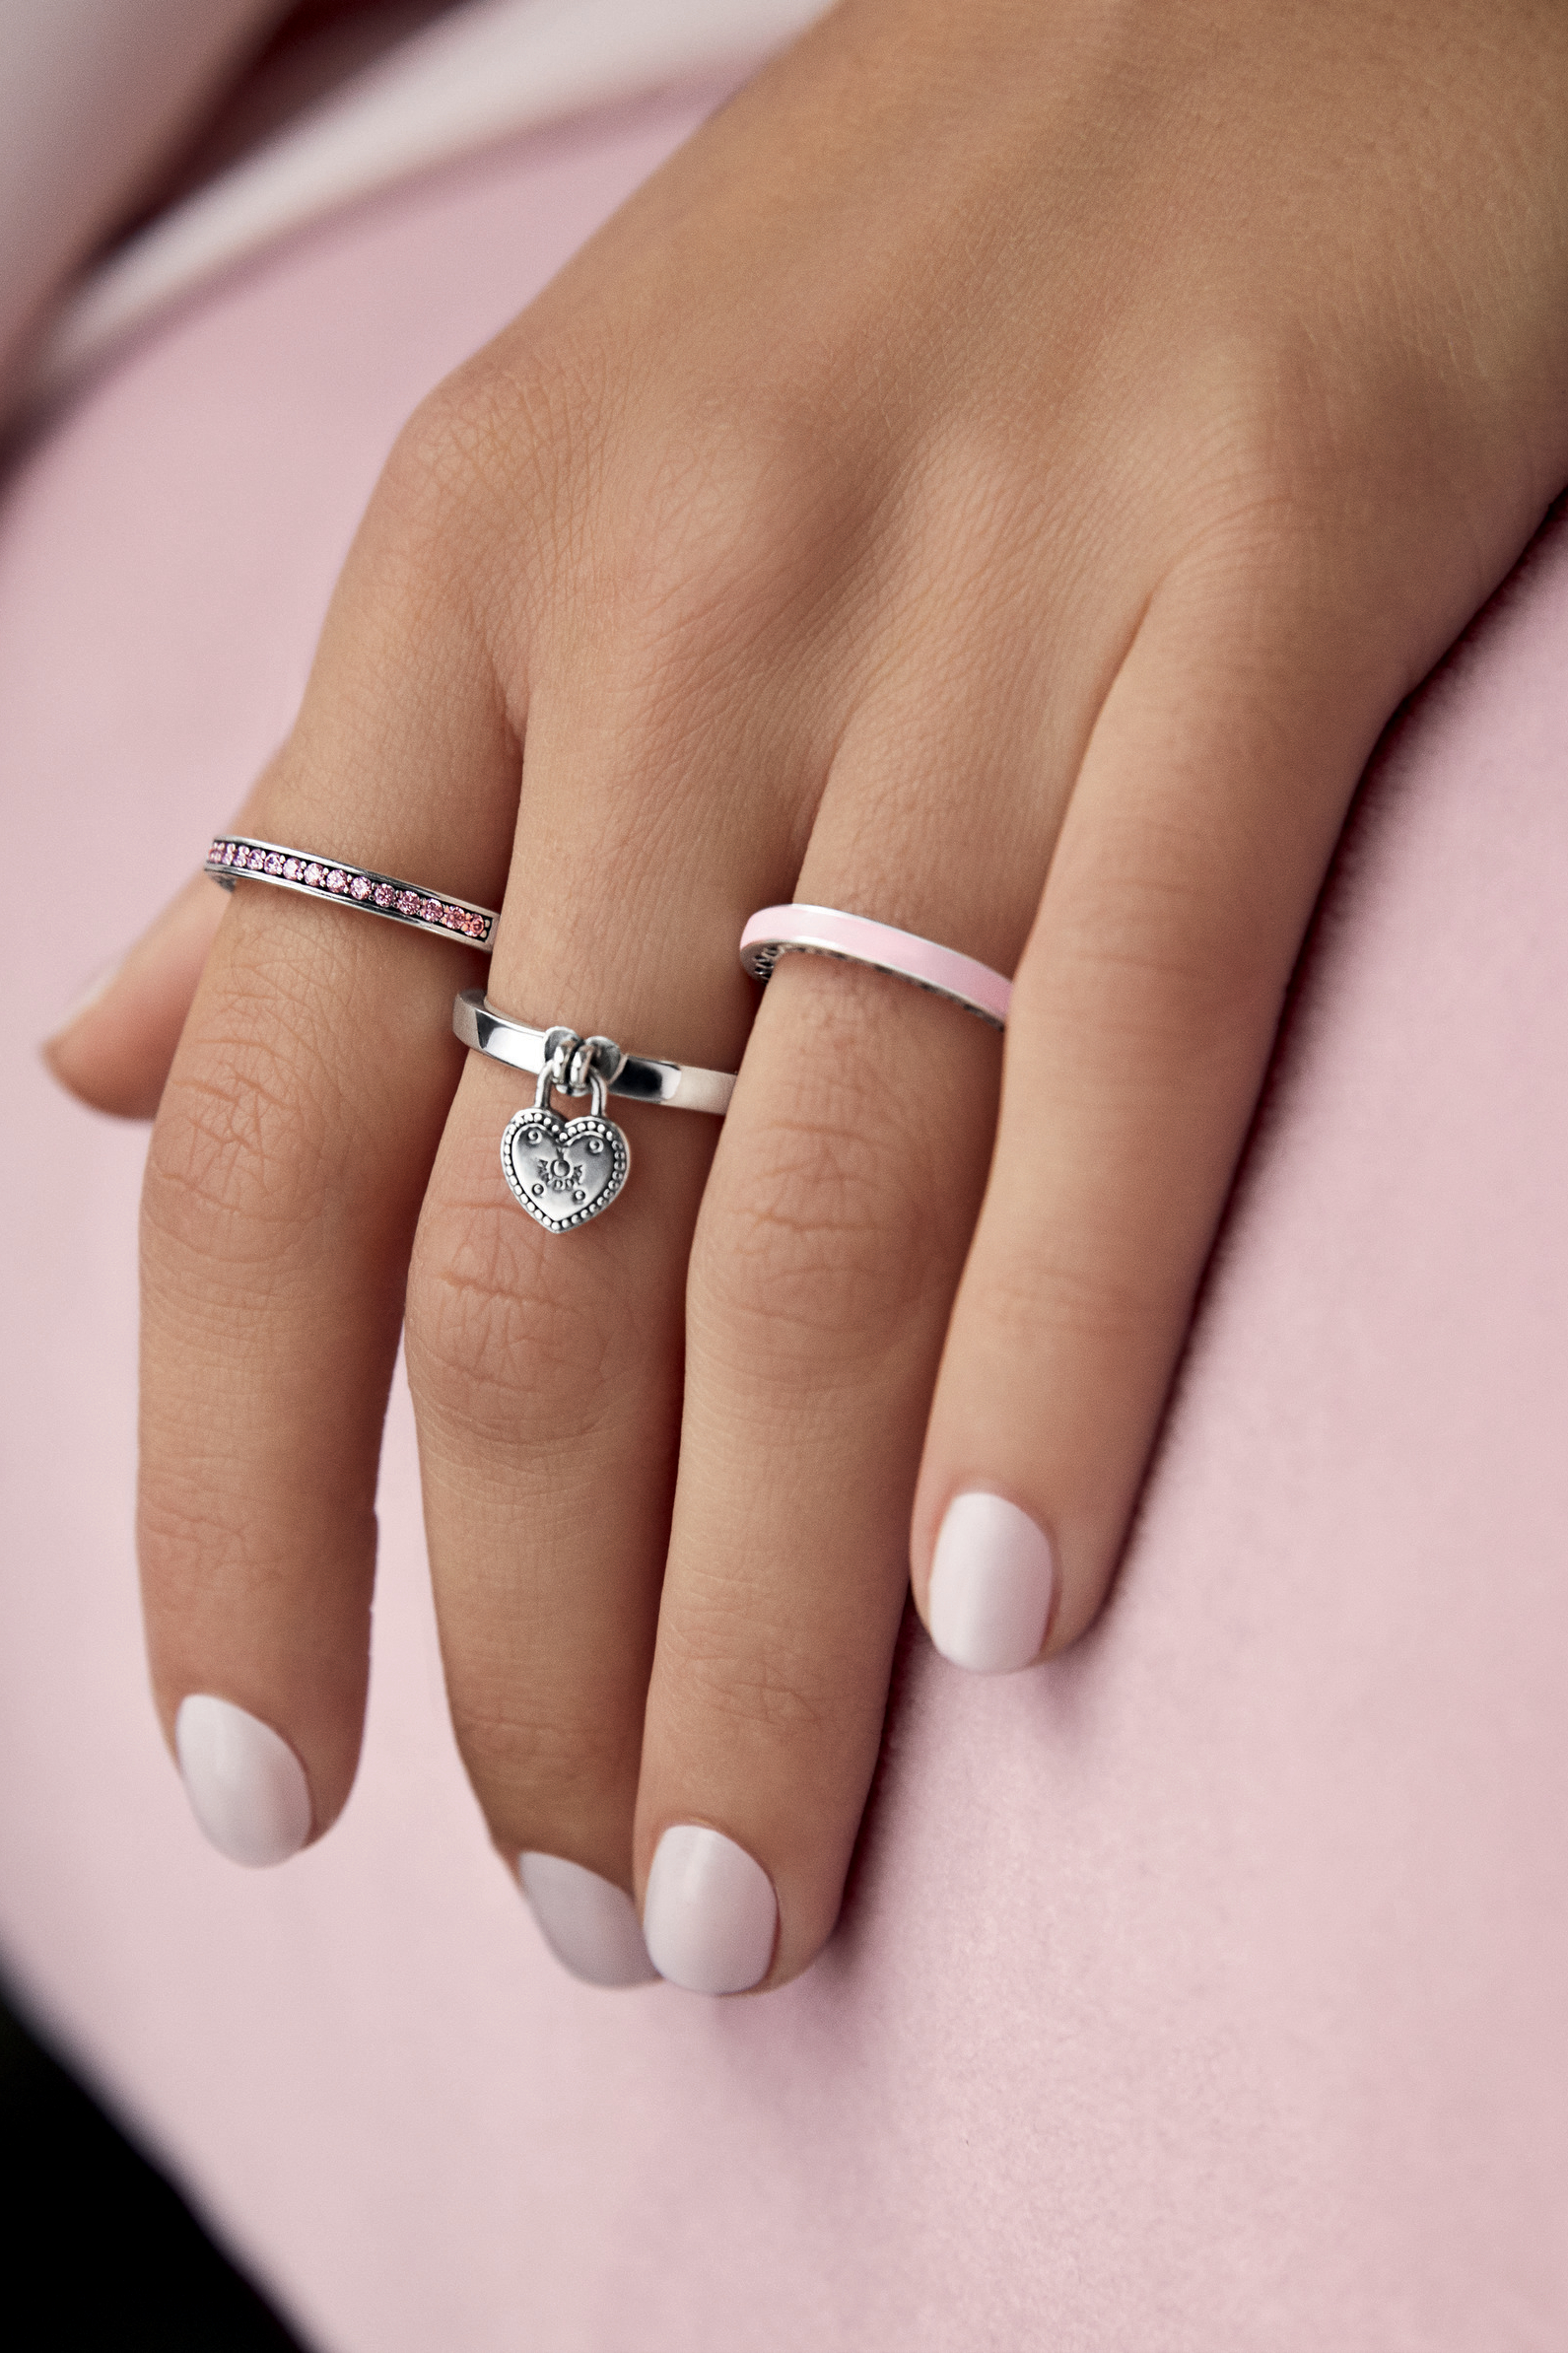 Valentine's Day Jewellery | Pandora Rings In 2019 | Pandora Rings Regarding Current Heart Shaped Padlock Rings (Gallery 3 of 25)